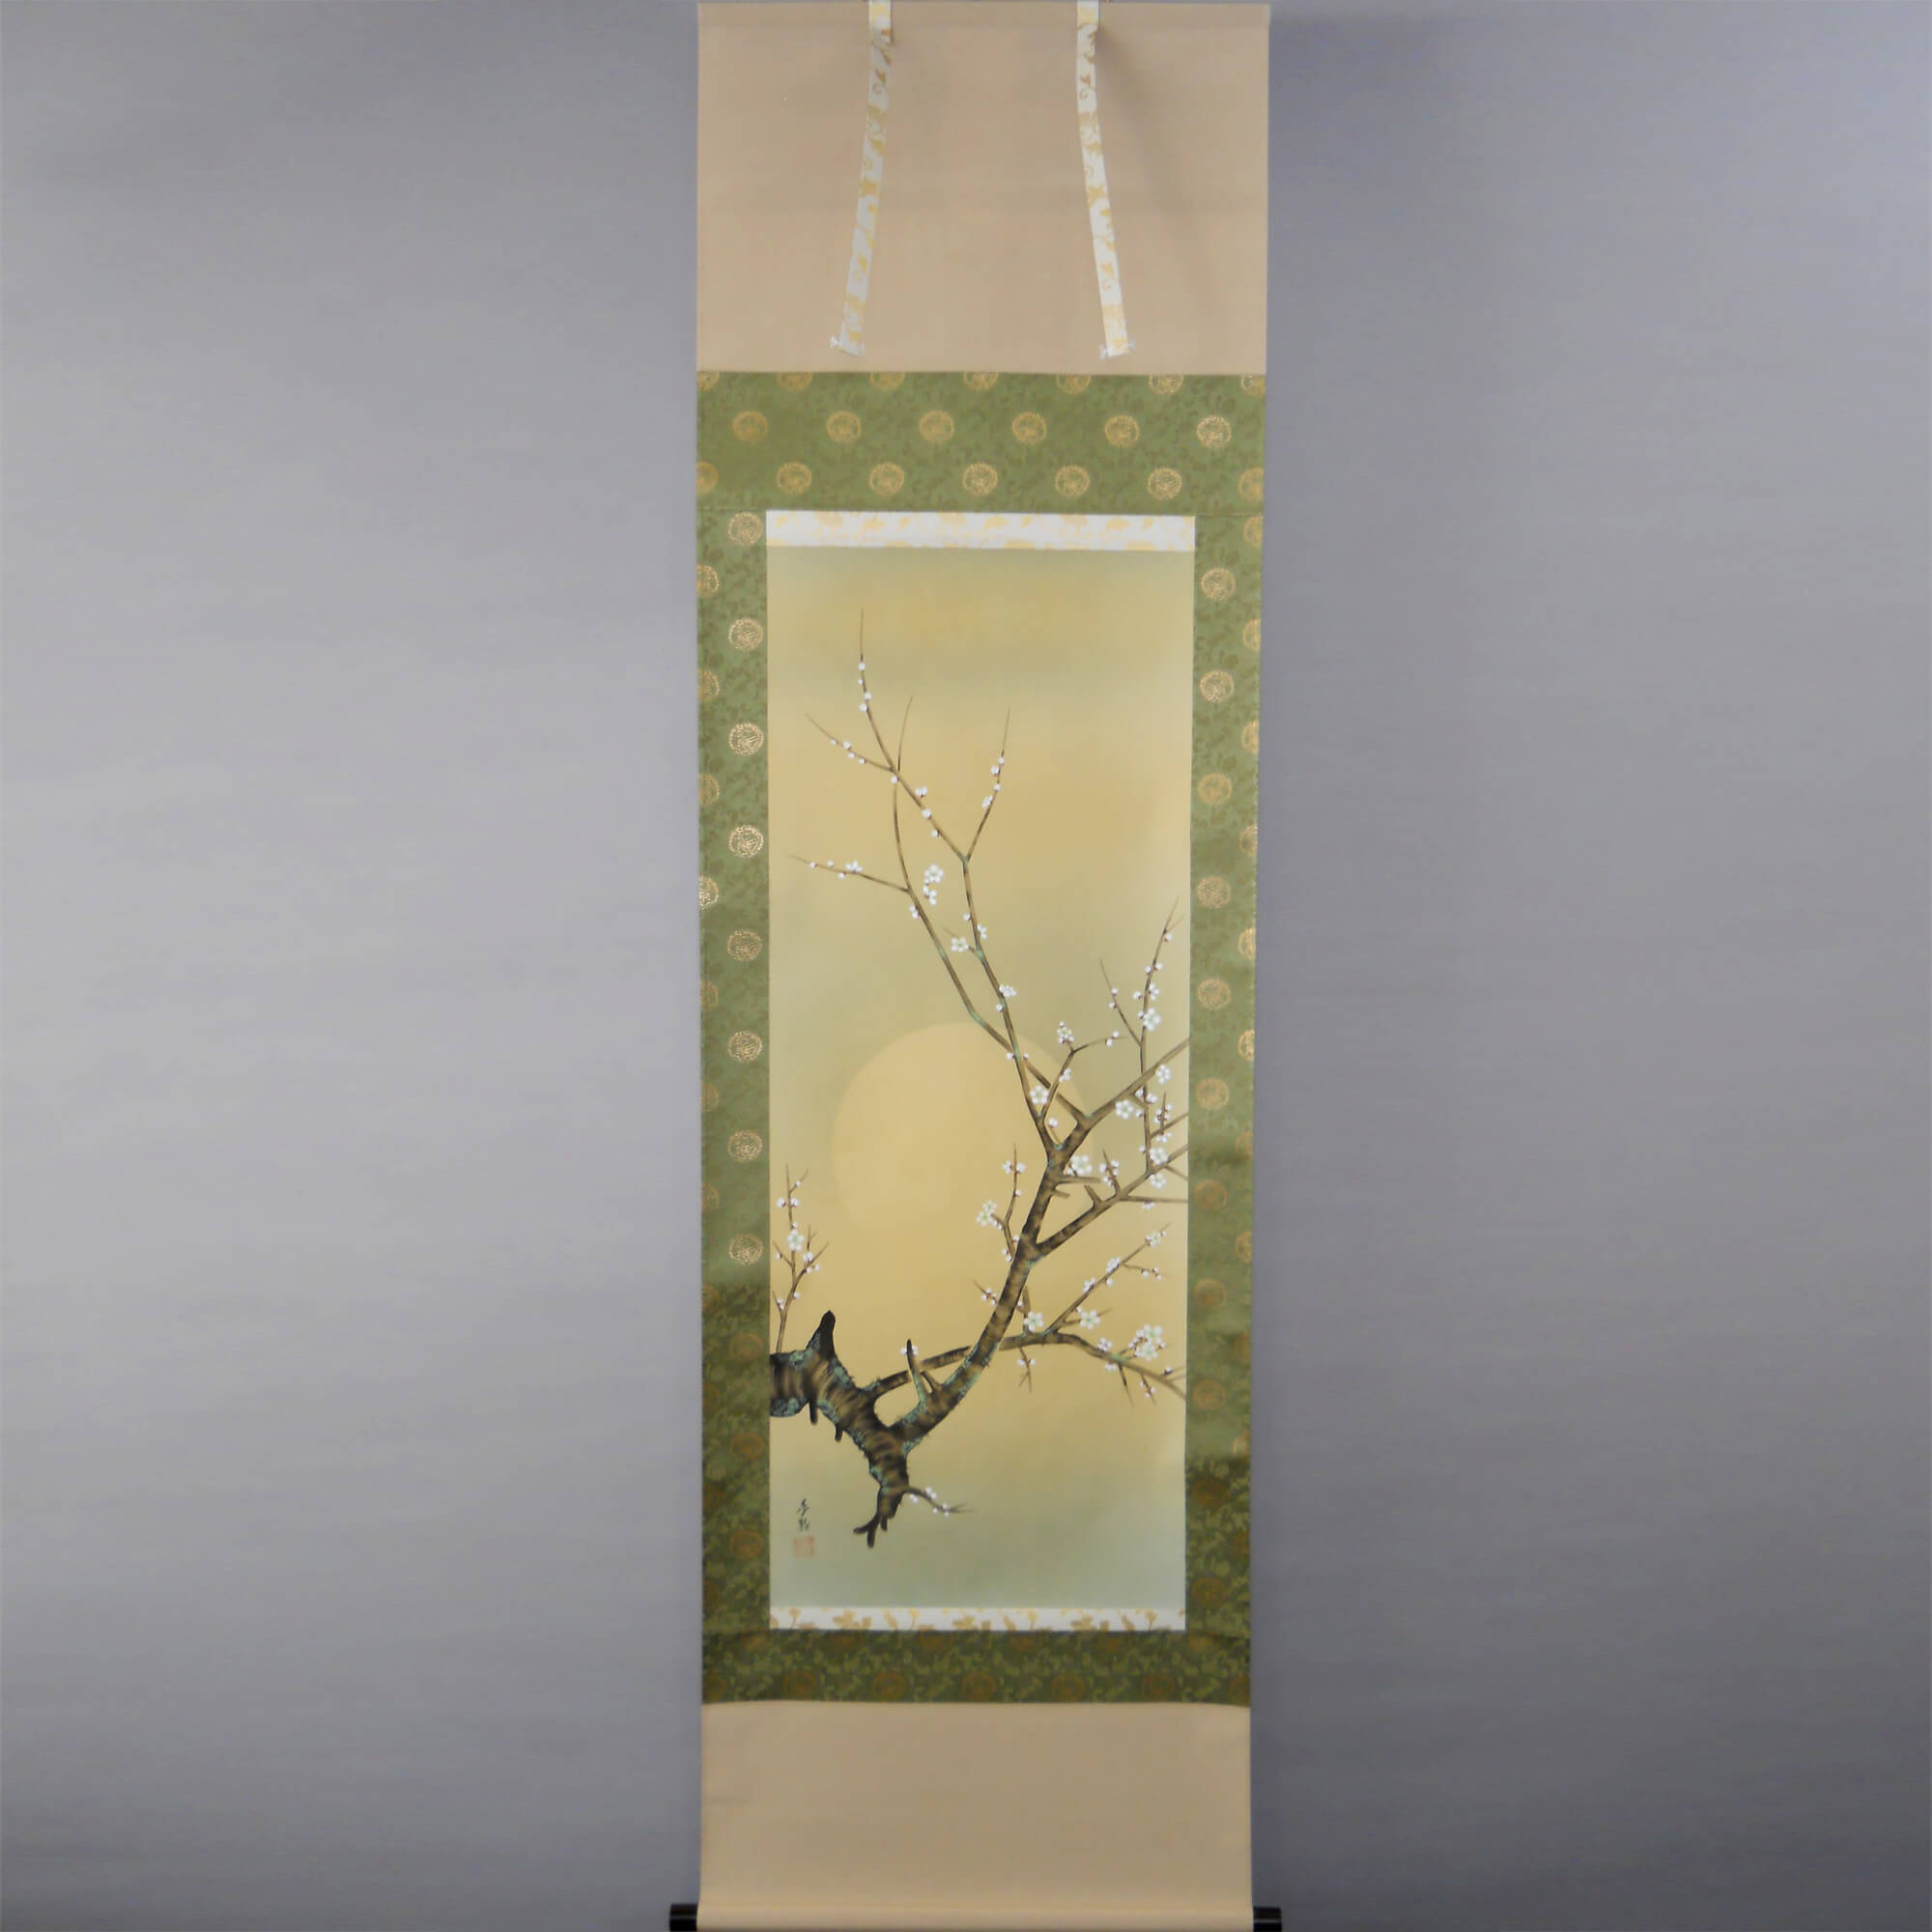 Plum Blossoms with the Moon / Yumeji Kinoshita